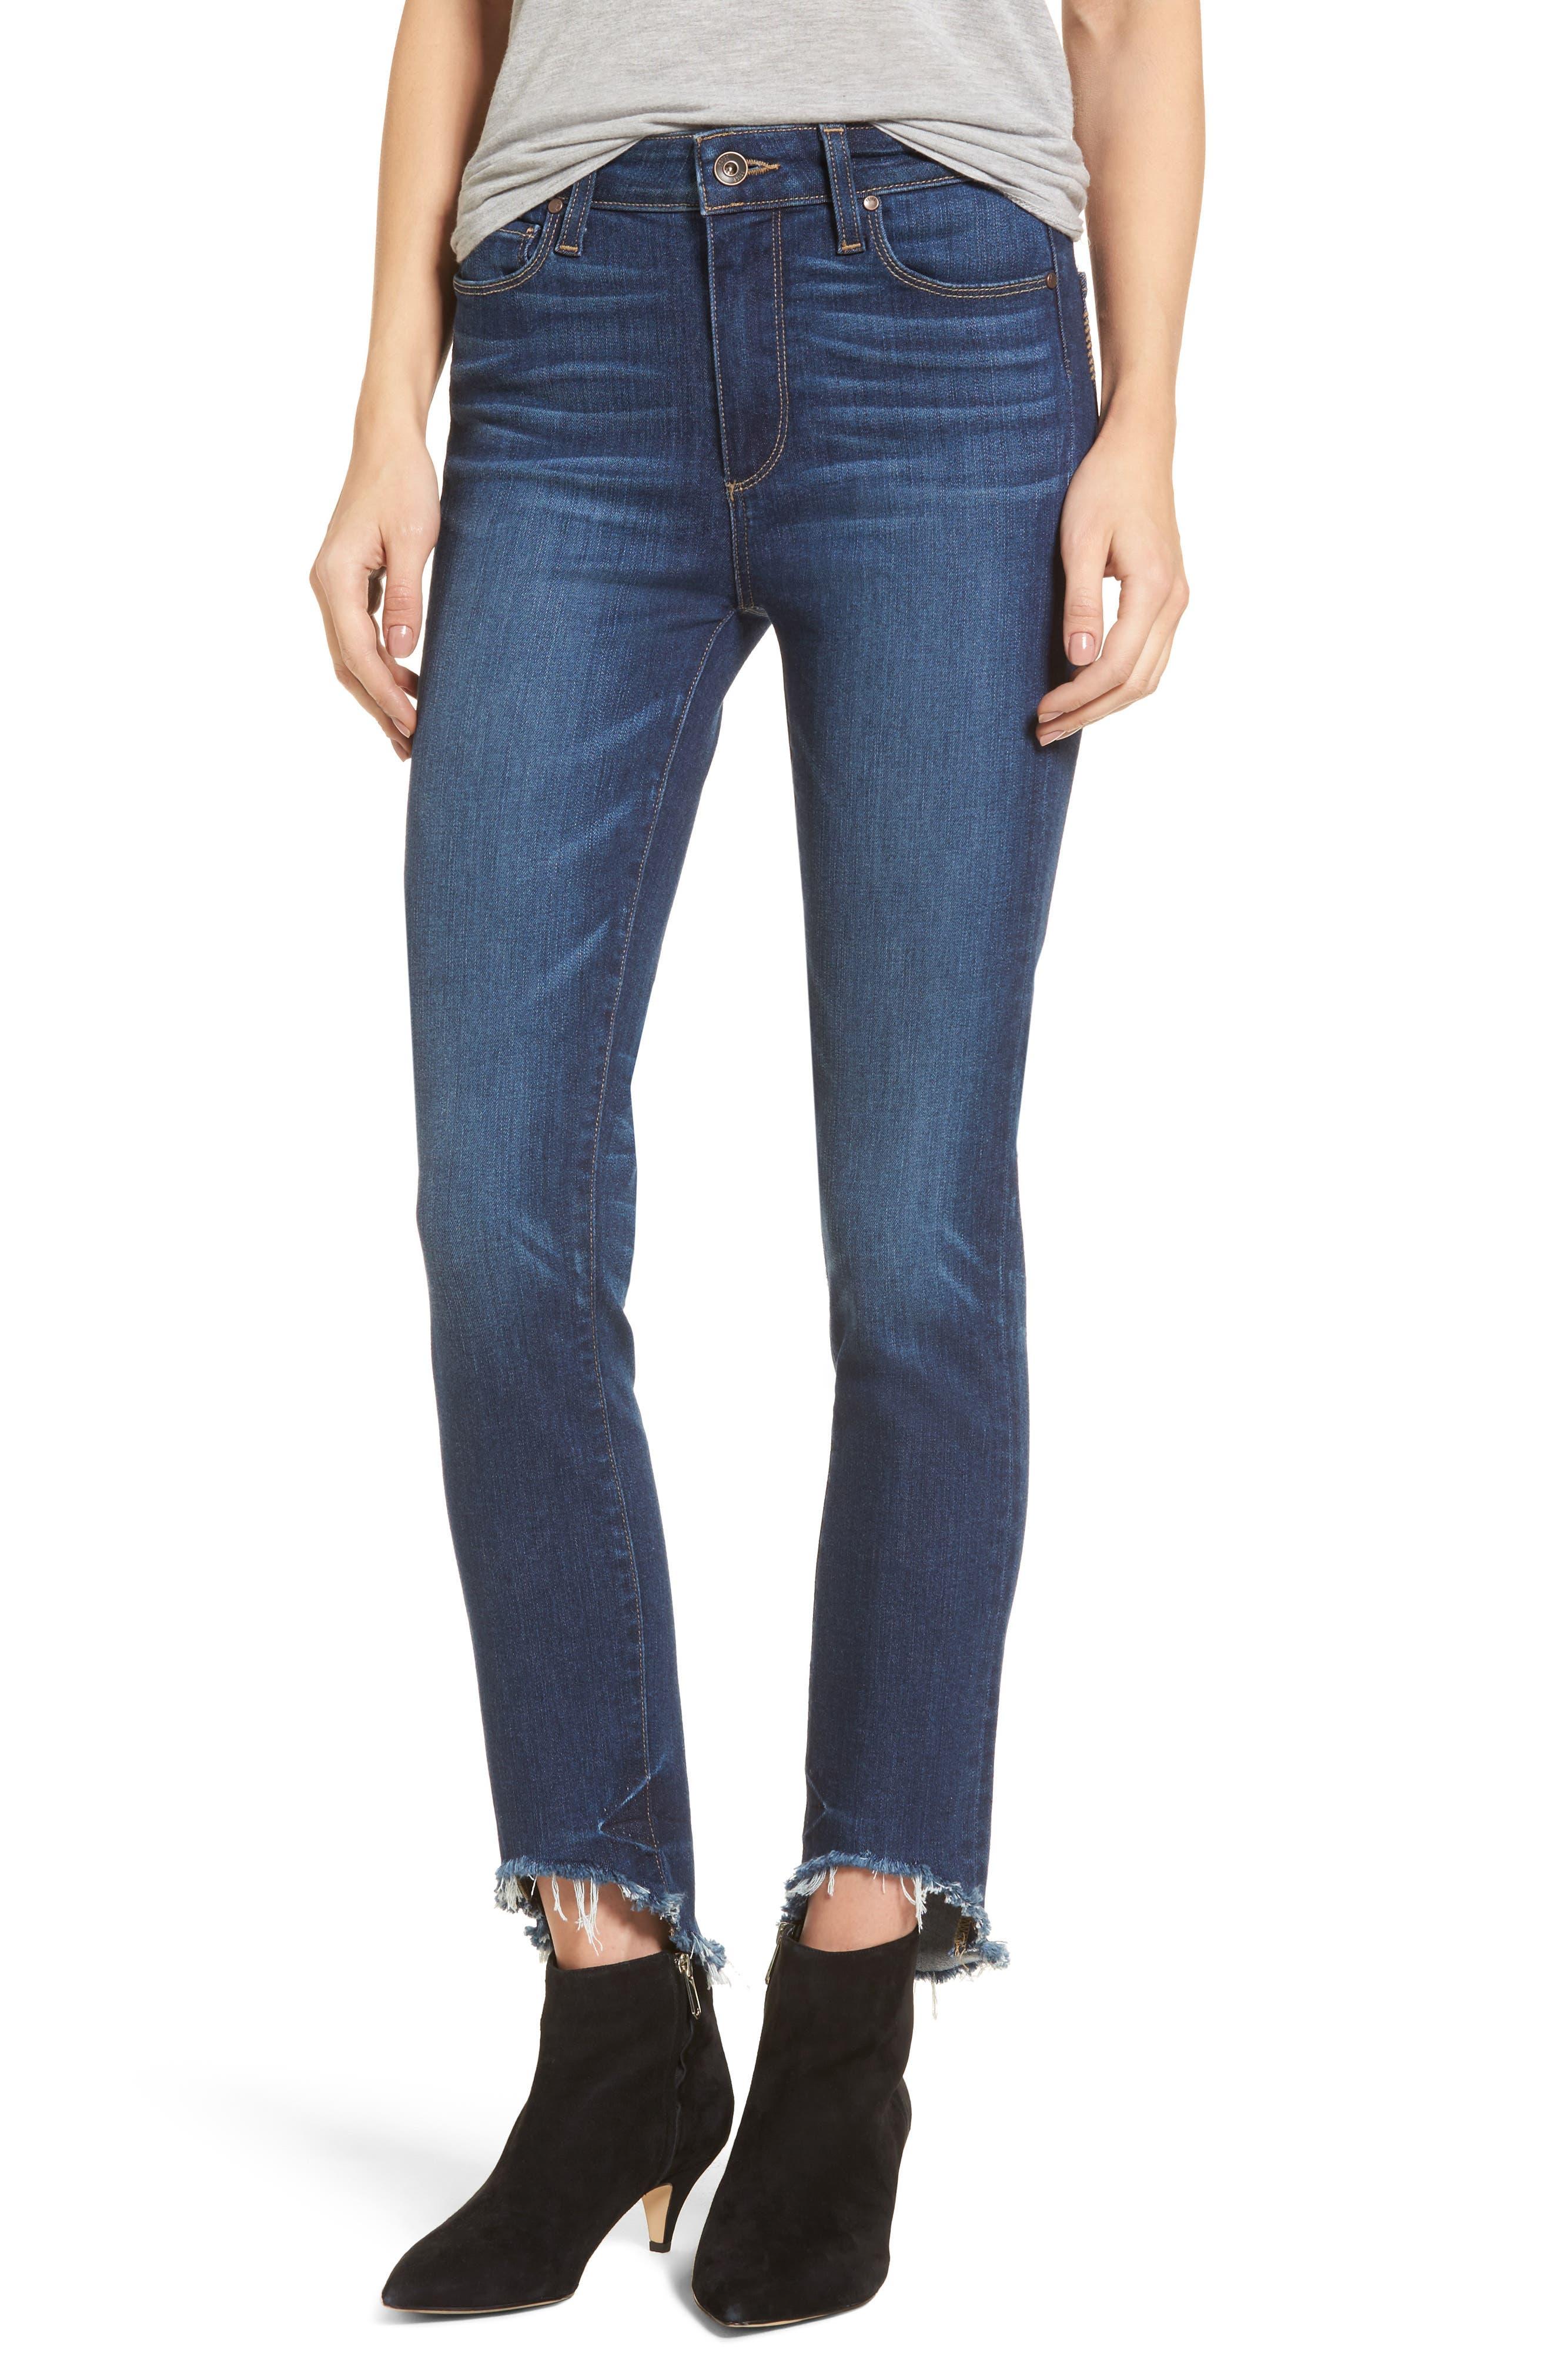 Transcend Vintage - Hoxton High Waist Ankle Skinny Jeans,                         Main,                         color,